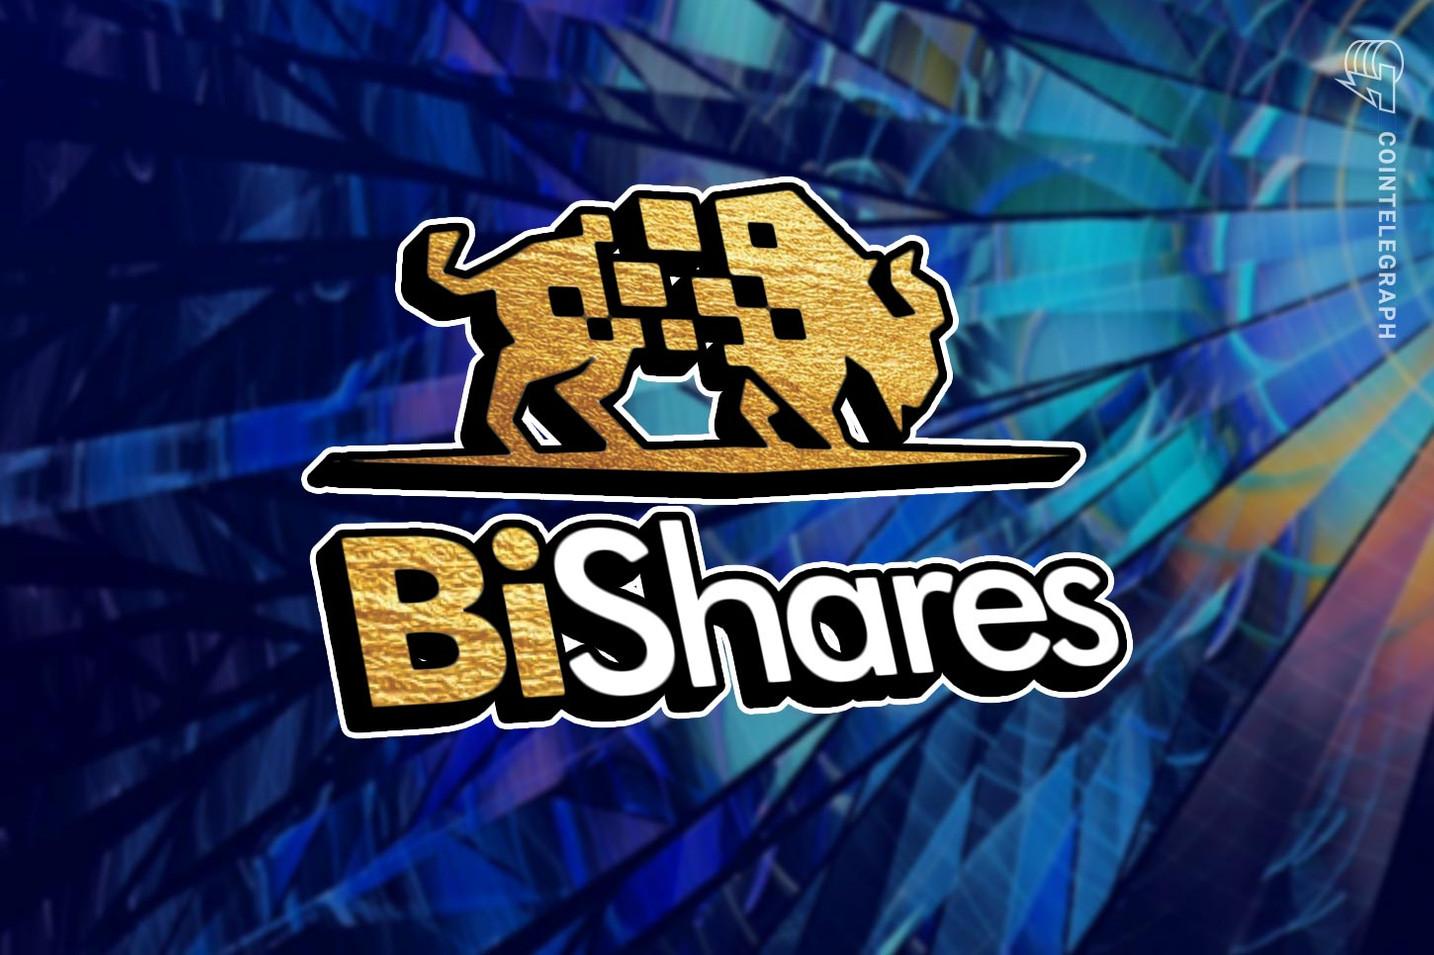 BiShares launches the dETF, Chain Fund (biChain)